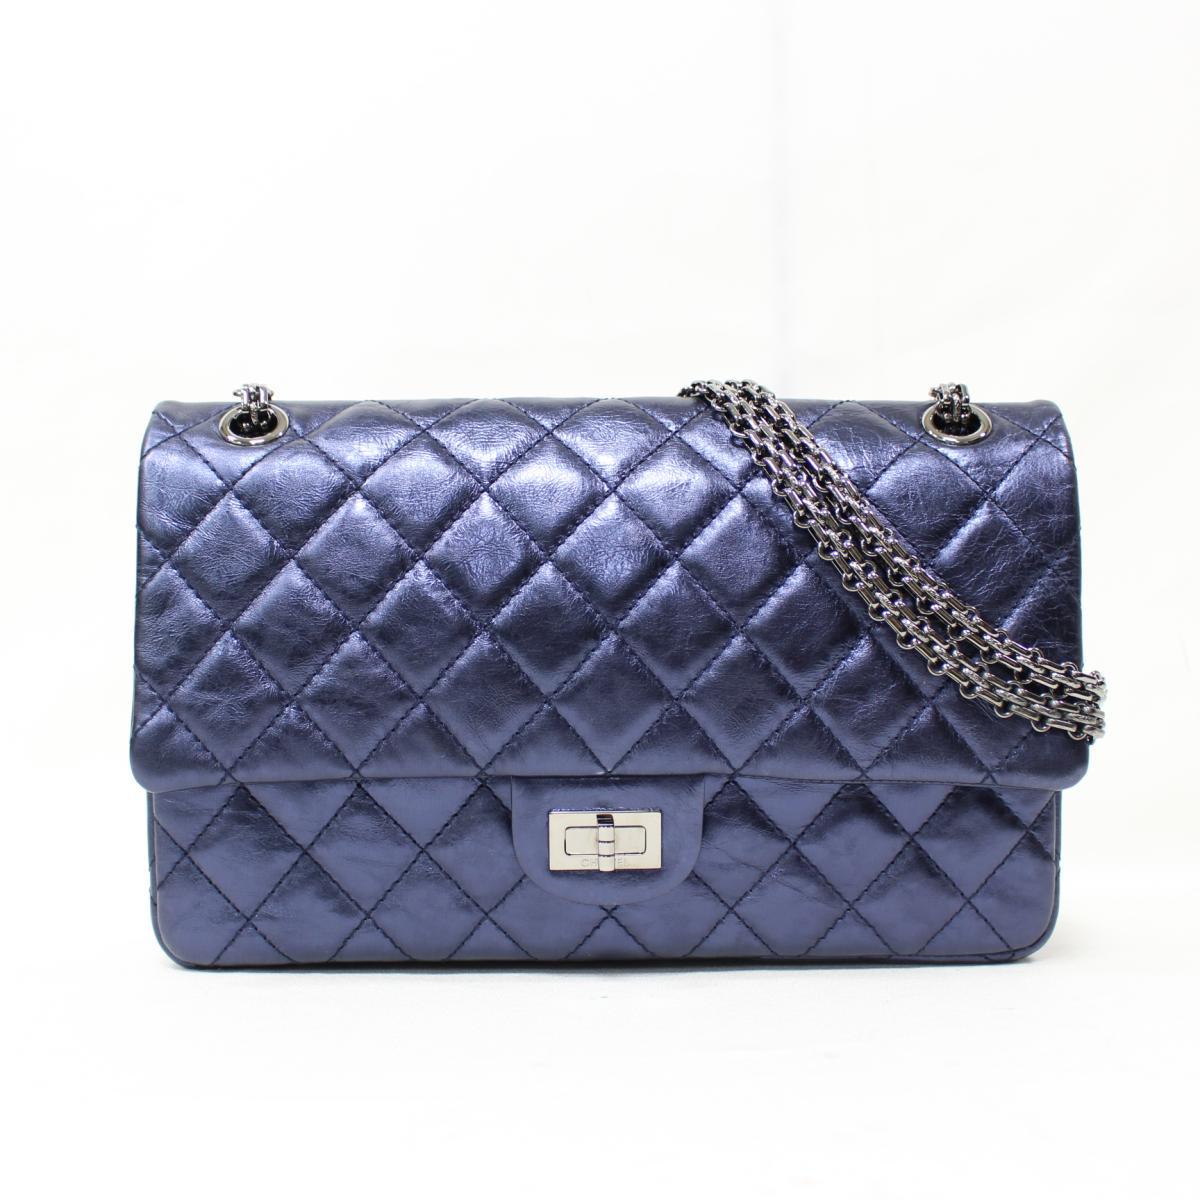 Authentic CHANEL 2.55 Classic W Flap Chain Shoulder Bag A37587 Calf Leather  Metallic Blue fbcf791ef2283